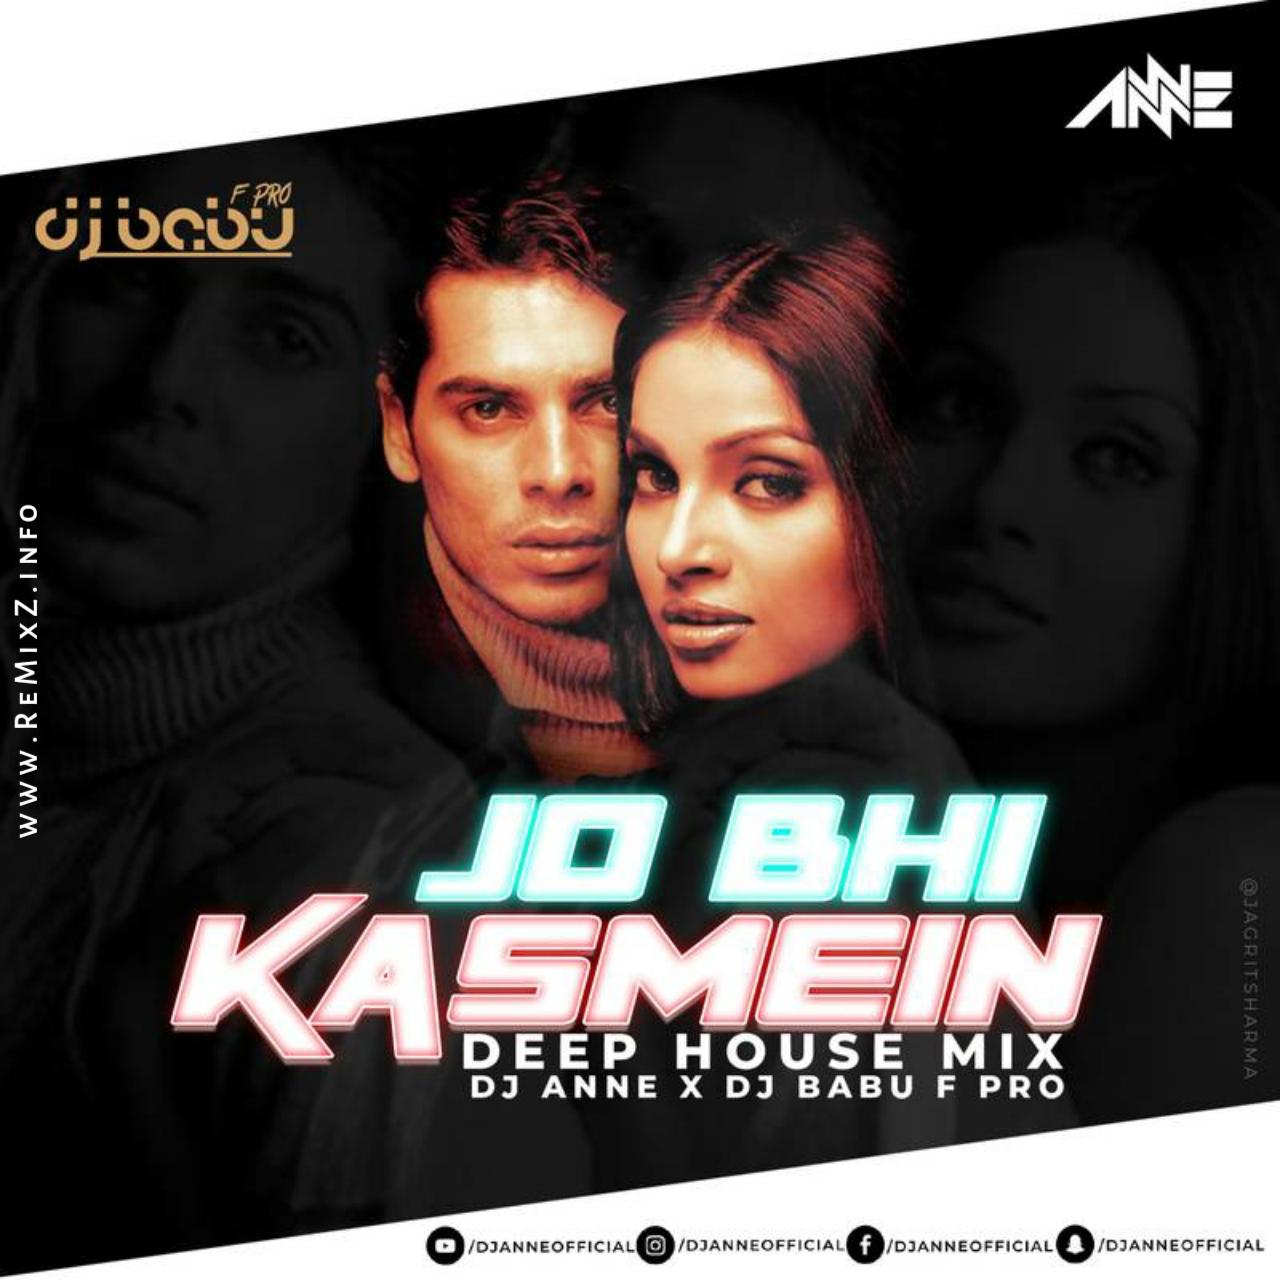 jo-bhi-kasmein-deep-house-mix-dj-anne-x-dj-babufpro.jpg